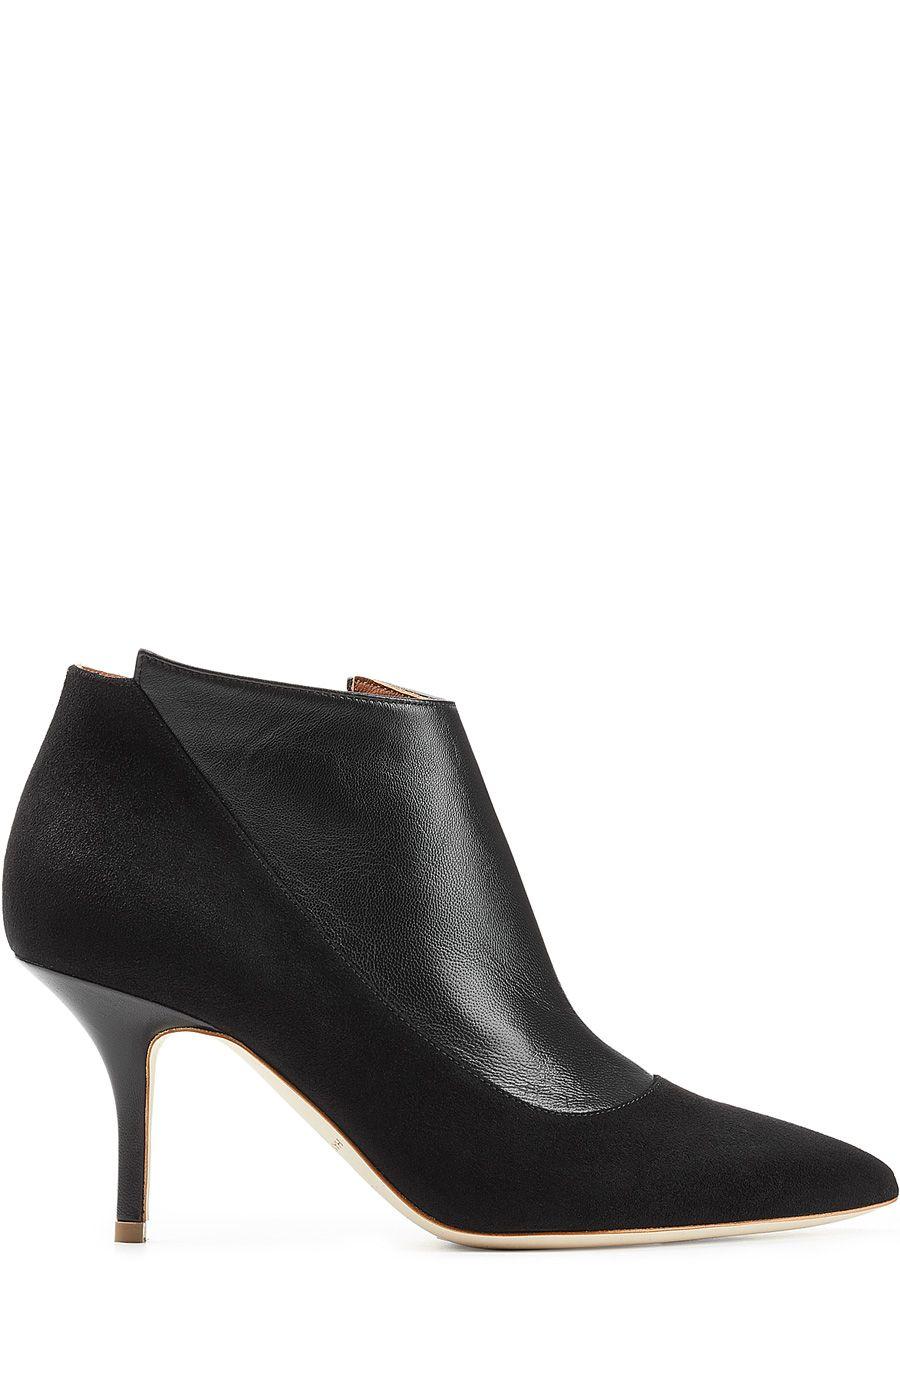 stiletto ankle boots - White Malone Souliers Visa Payment Sale Online oC80qaOLi